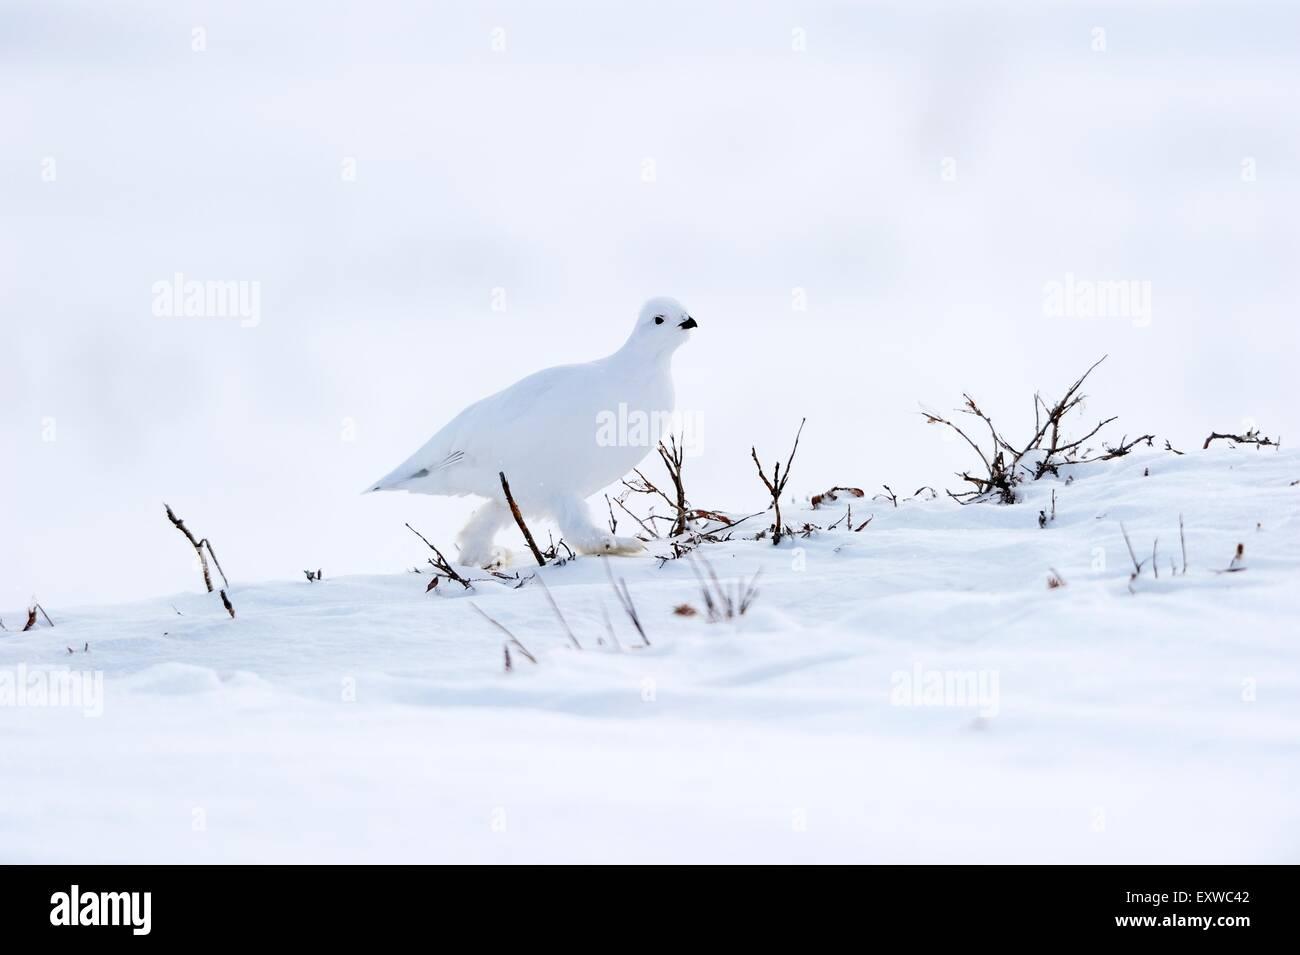 Willow Ptarmigan (Lagopus lagopus) in white plumage in the frozen, snowy, Arctic tundra, Alaska, USA Stock Photo